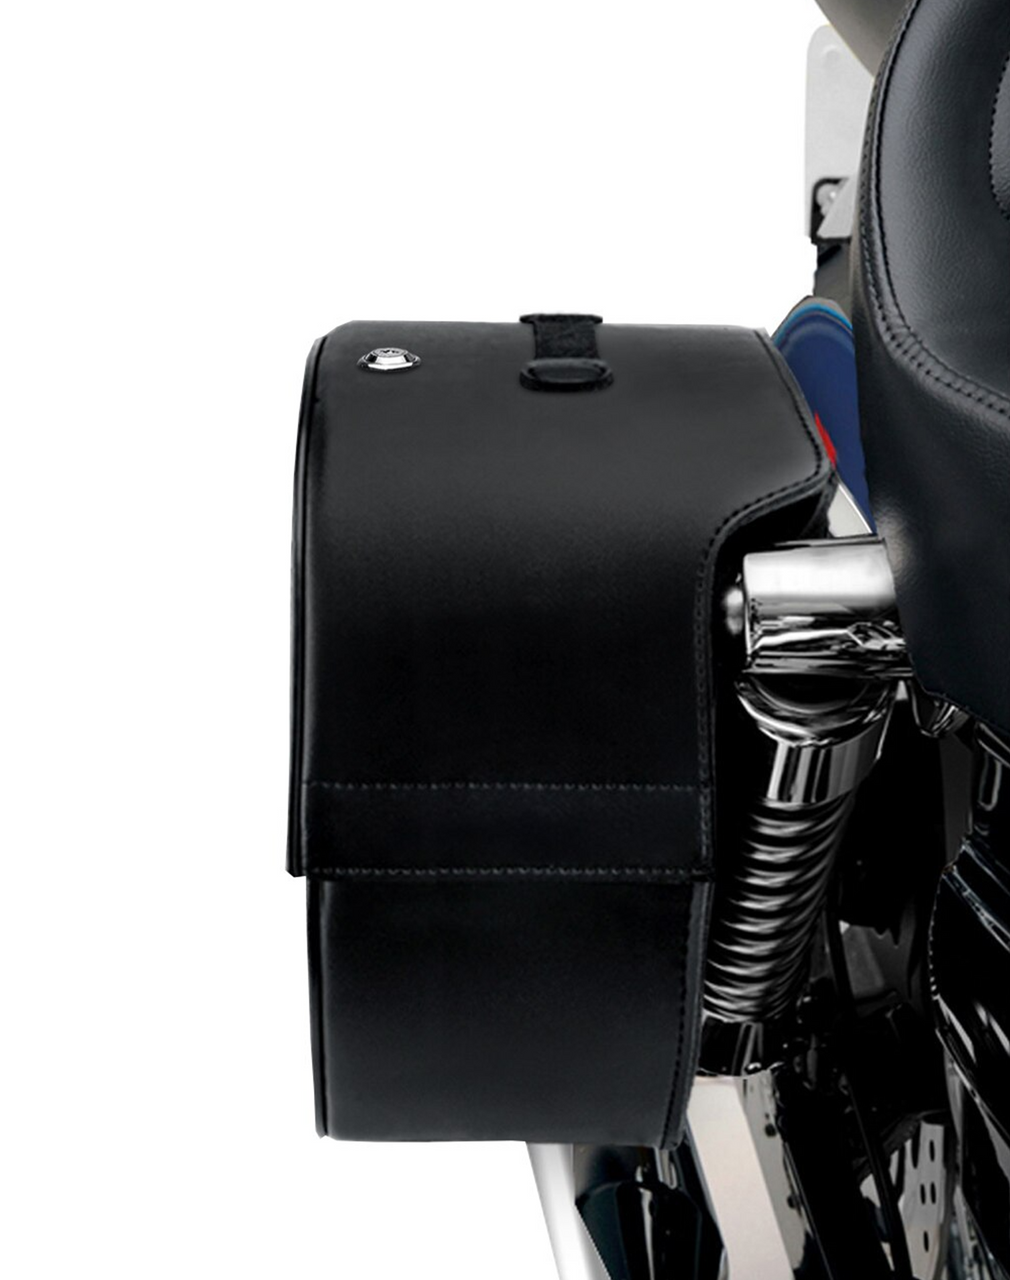 Triumph Rocket III Range Viking Armor Shock Cutout Large Motorcycle Saddlebags Shock Cutout View